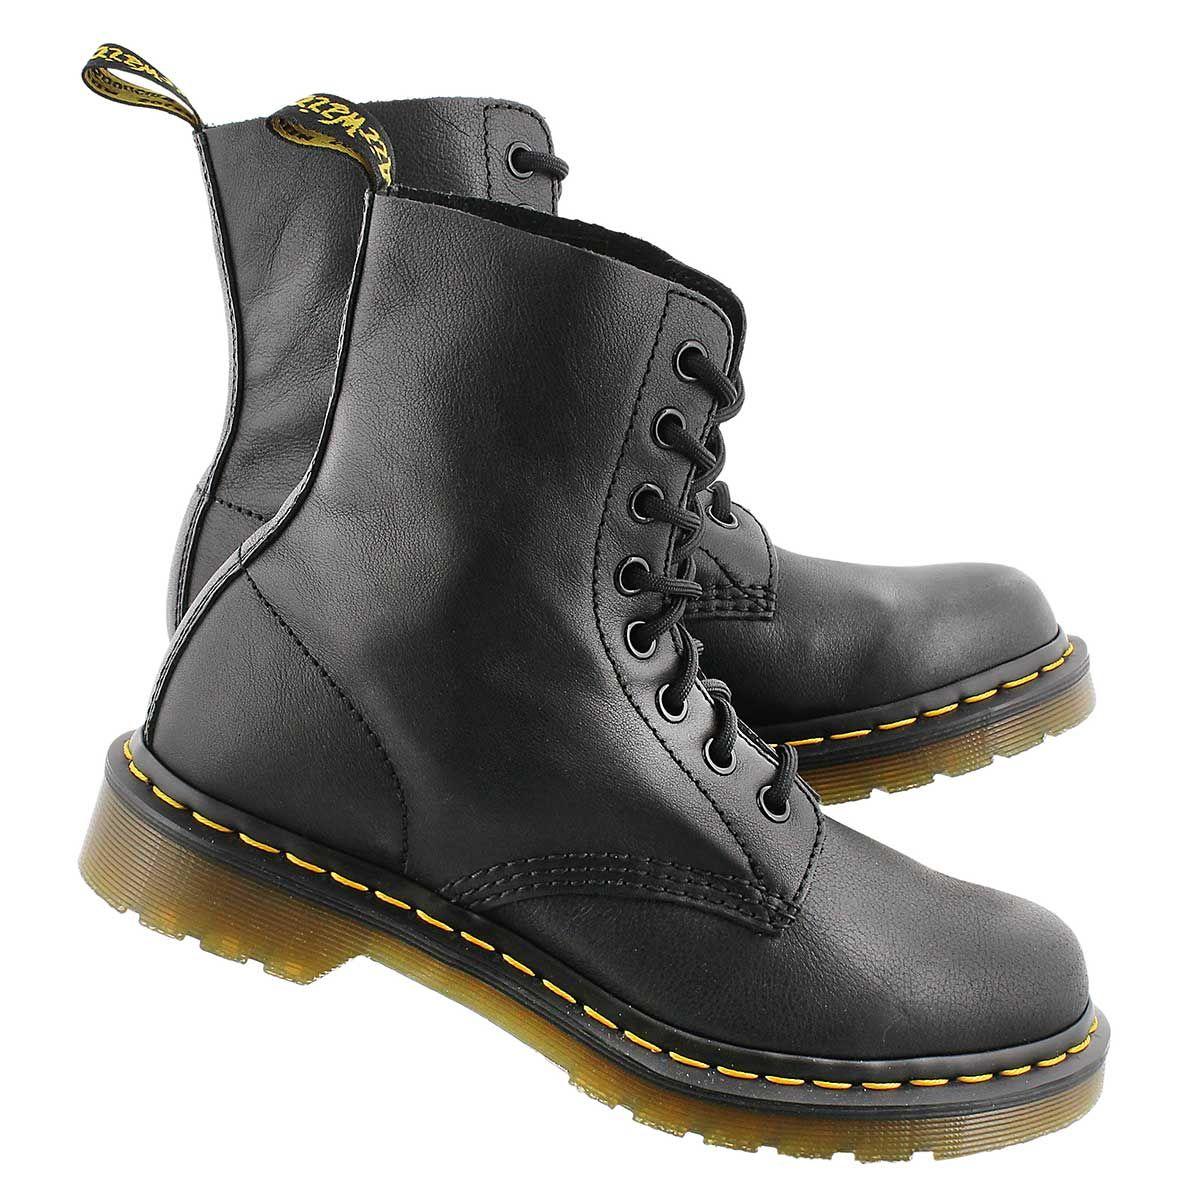 Dr Martens femme Bottines Boots pascal rouge,chaussures dr